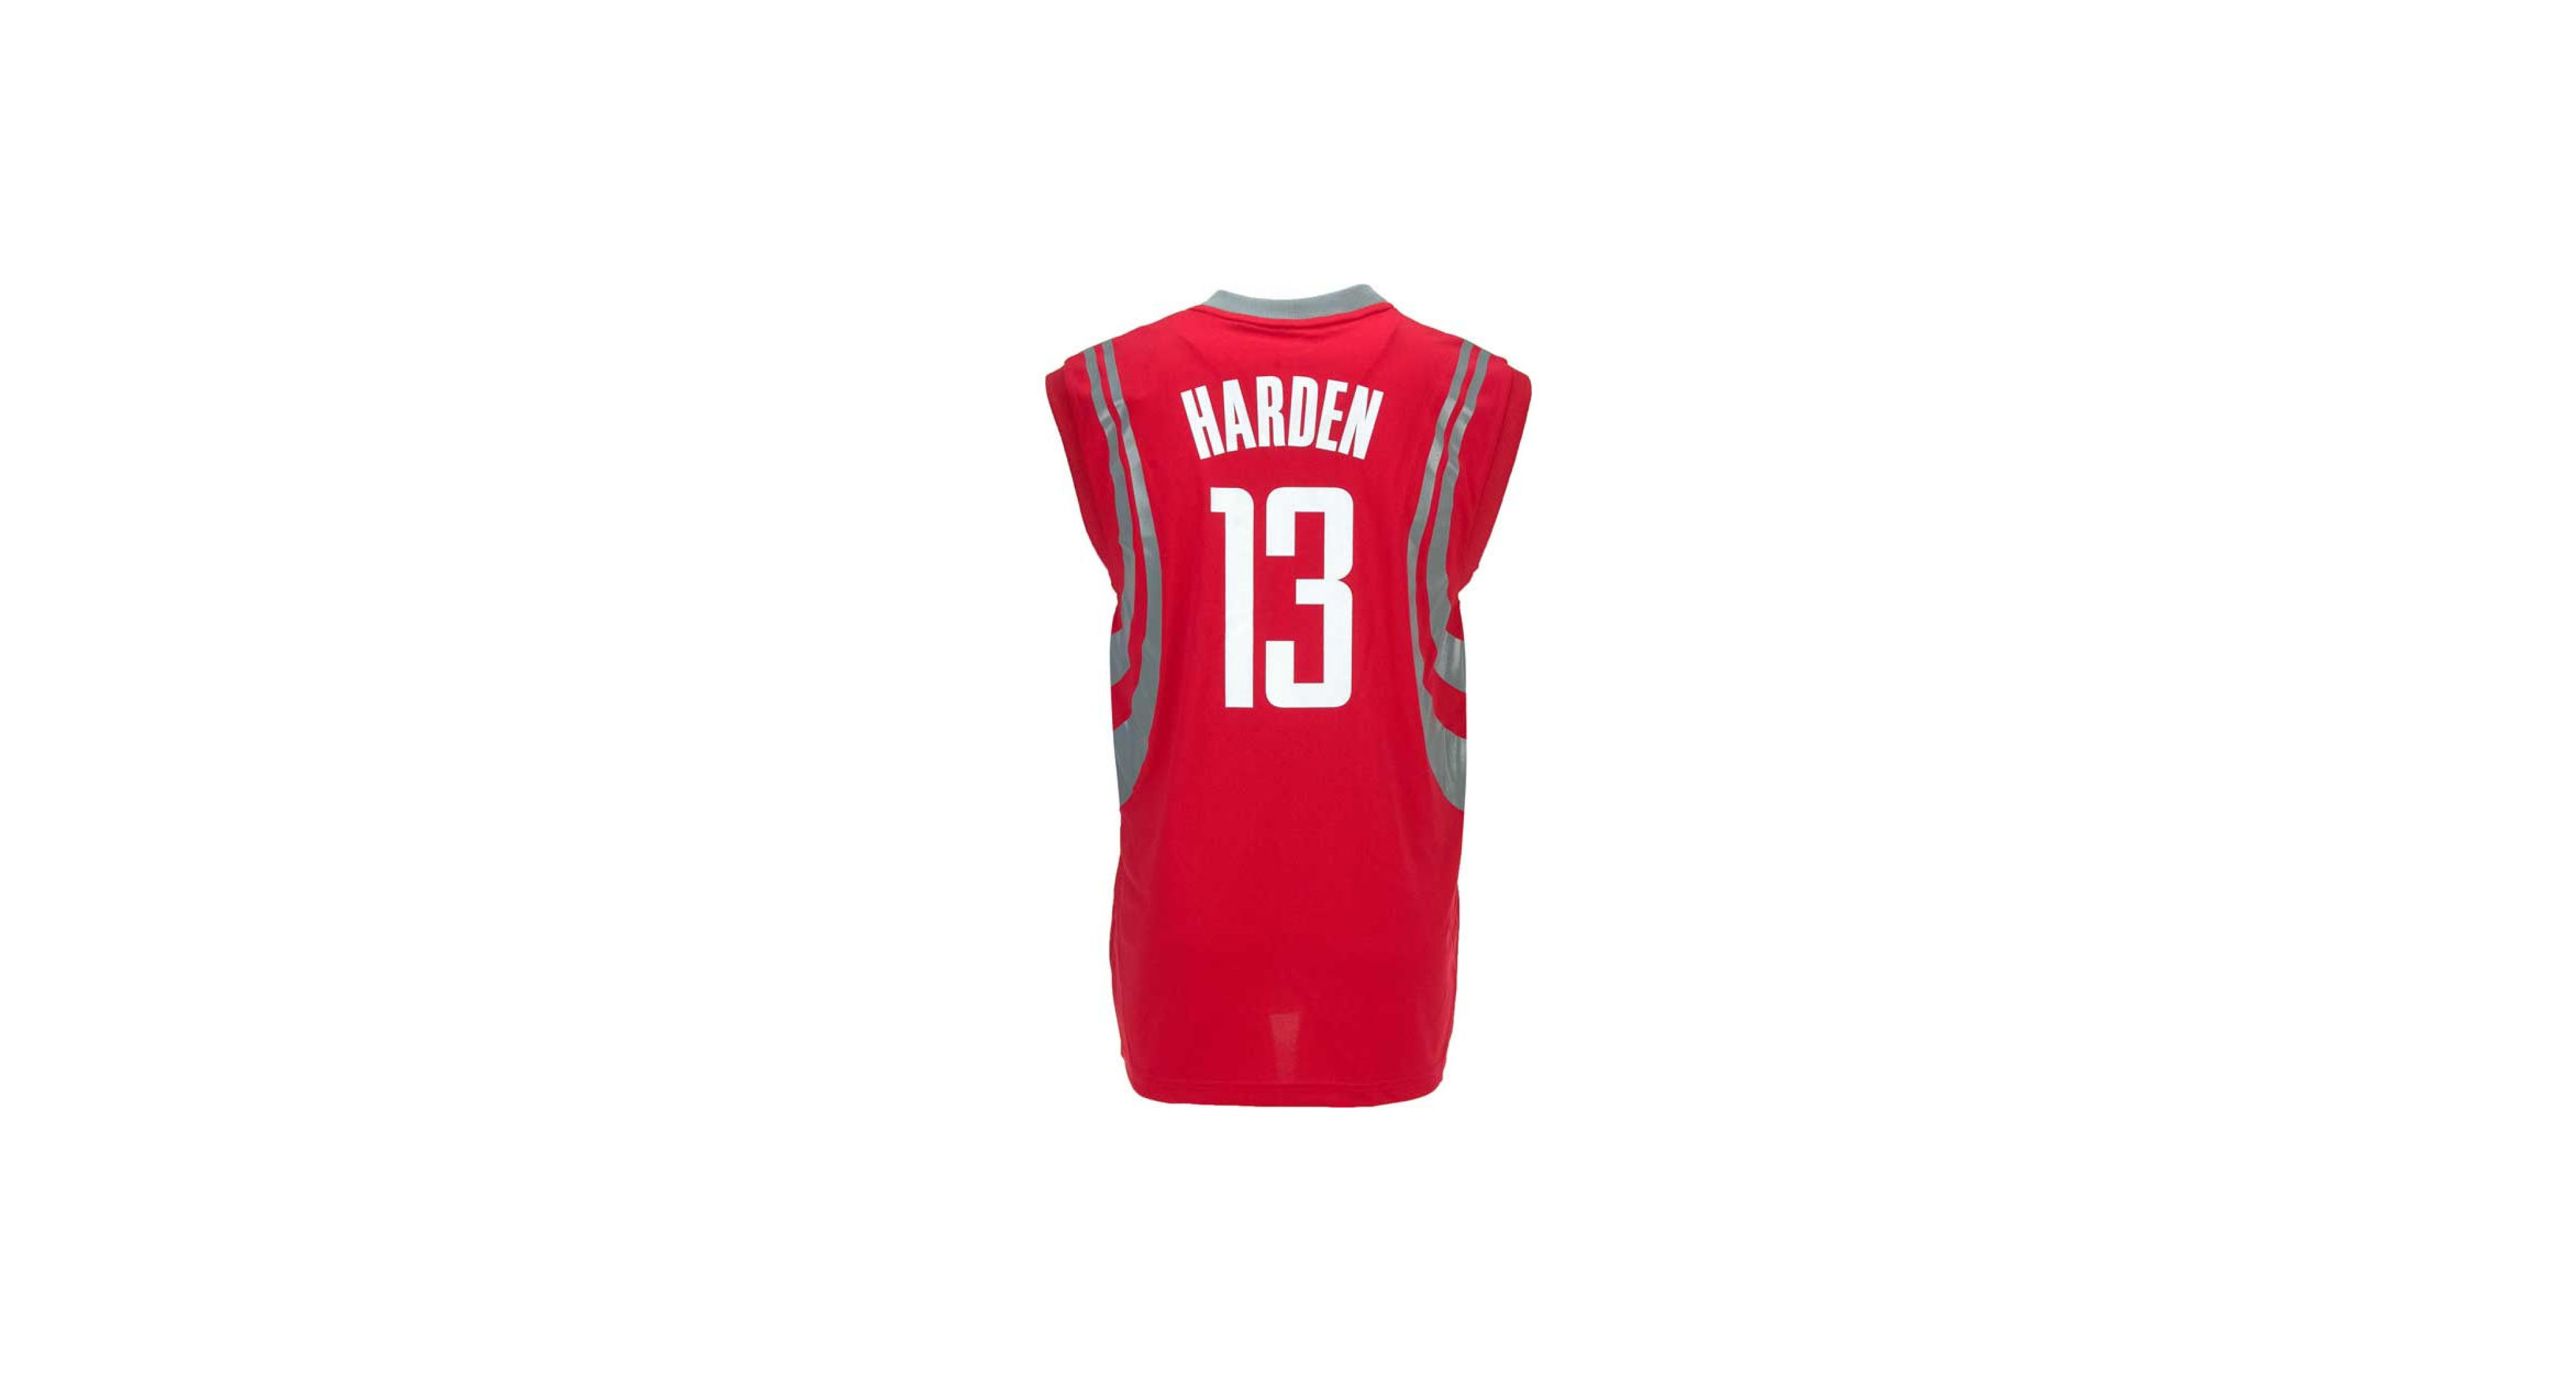 official photos b12eb 17c11 adidas Kids' James Harden Houston Rockets Revolution 30 ...